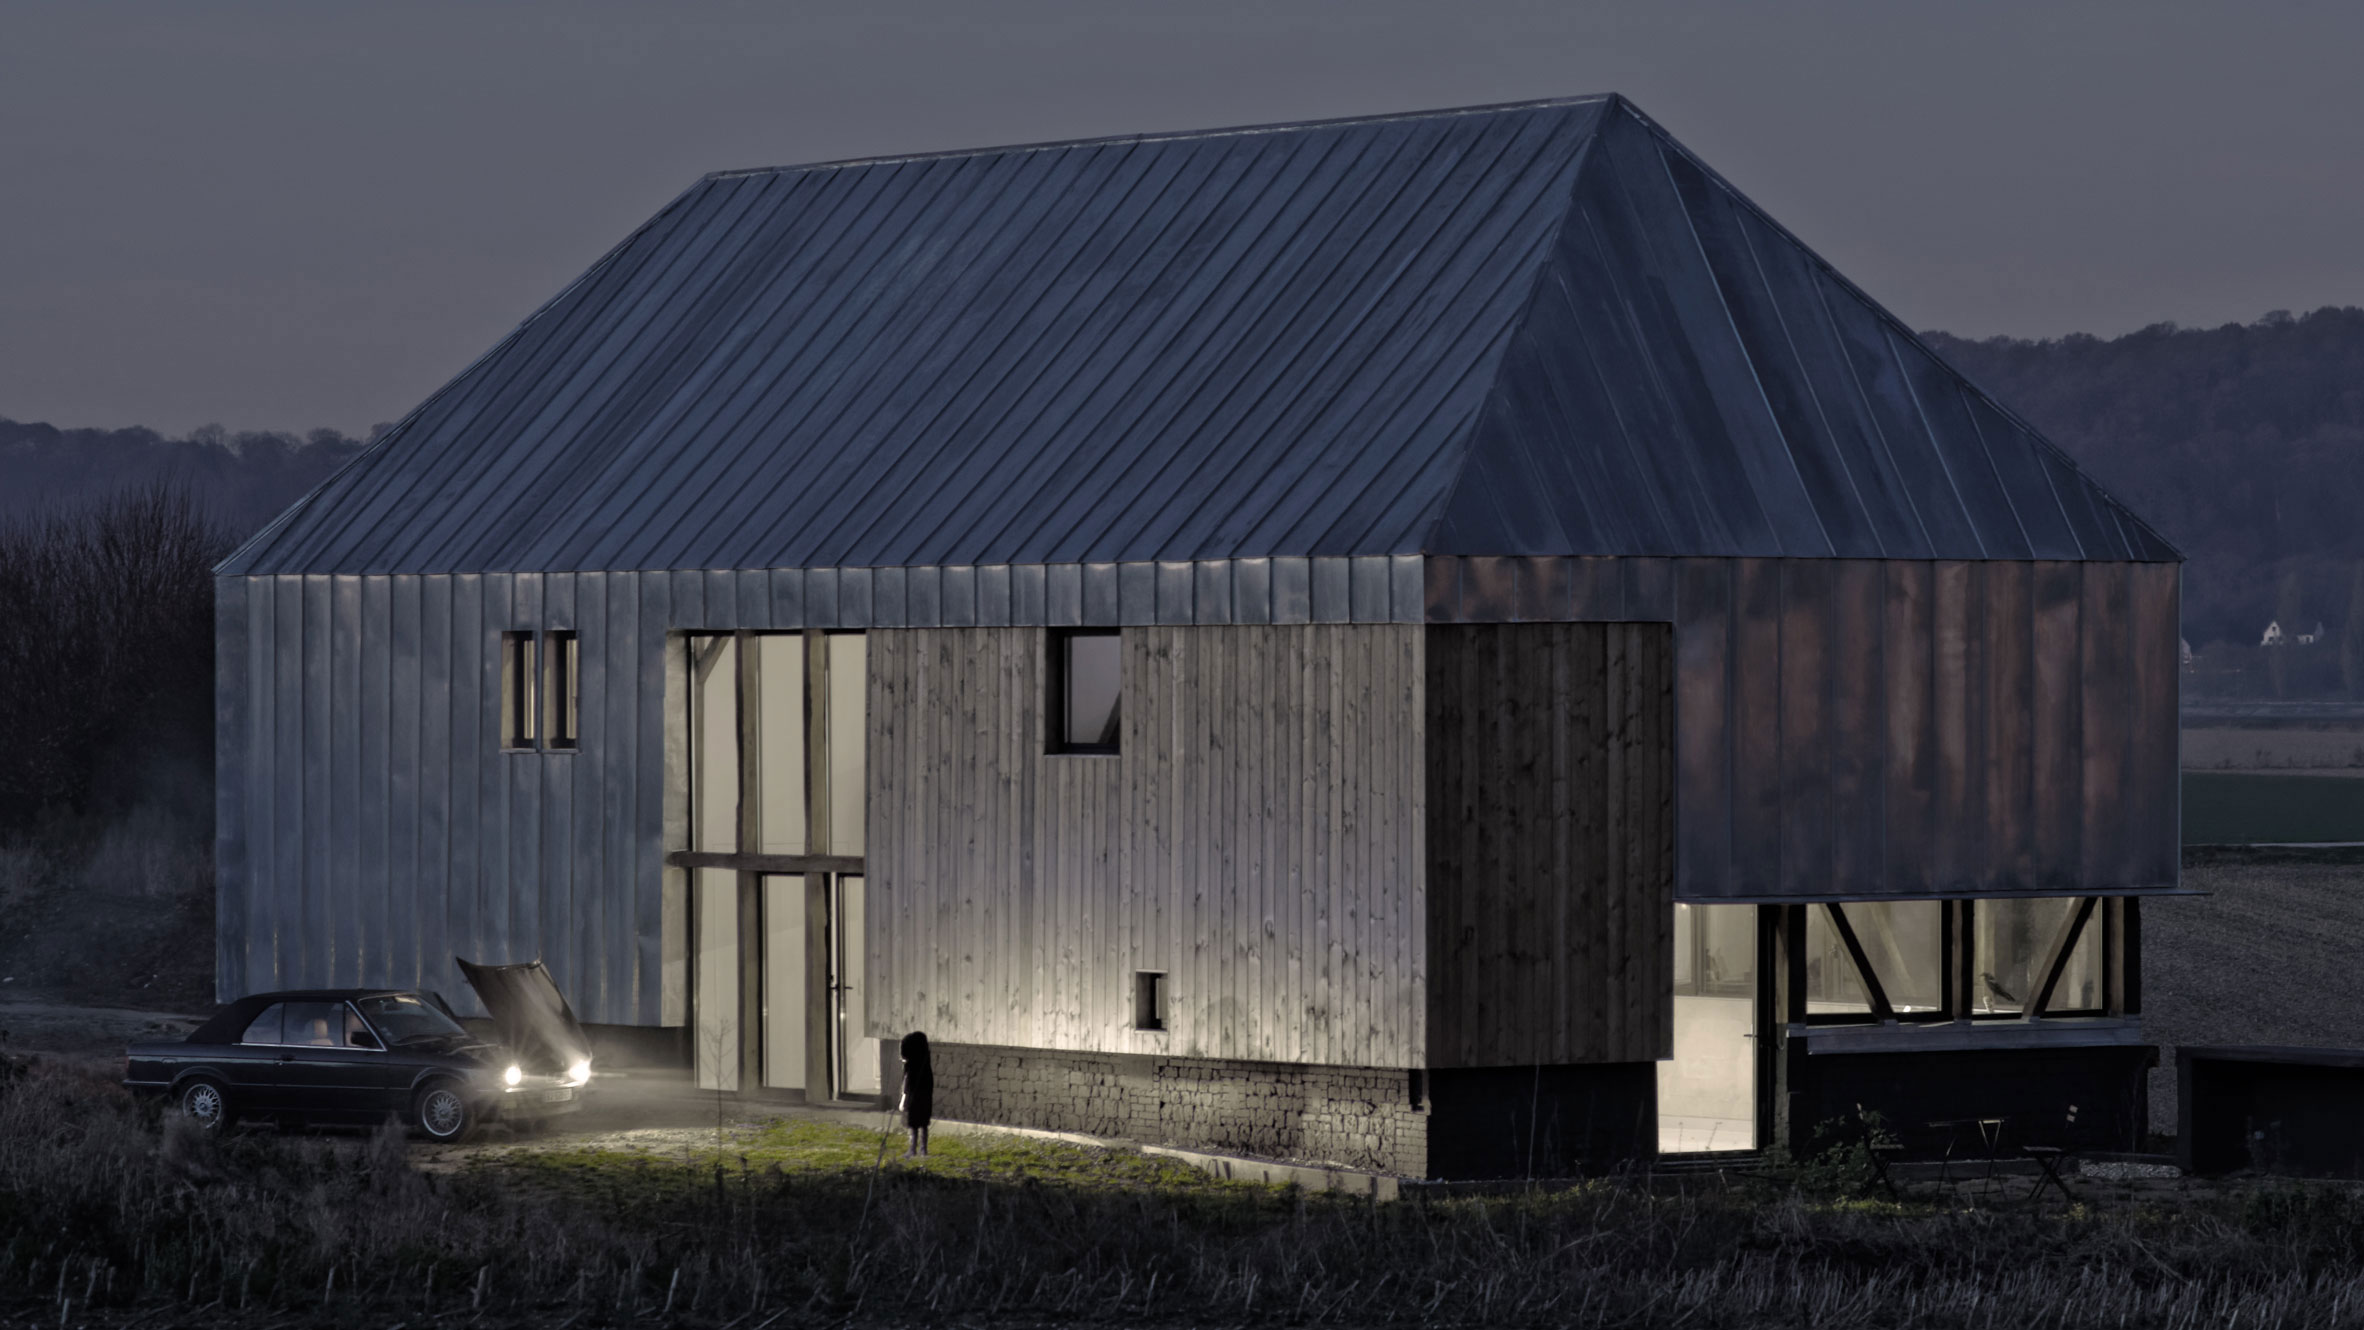 Antonin-Ziegler-covers-abandoned-barn-in-zinc-plates-12